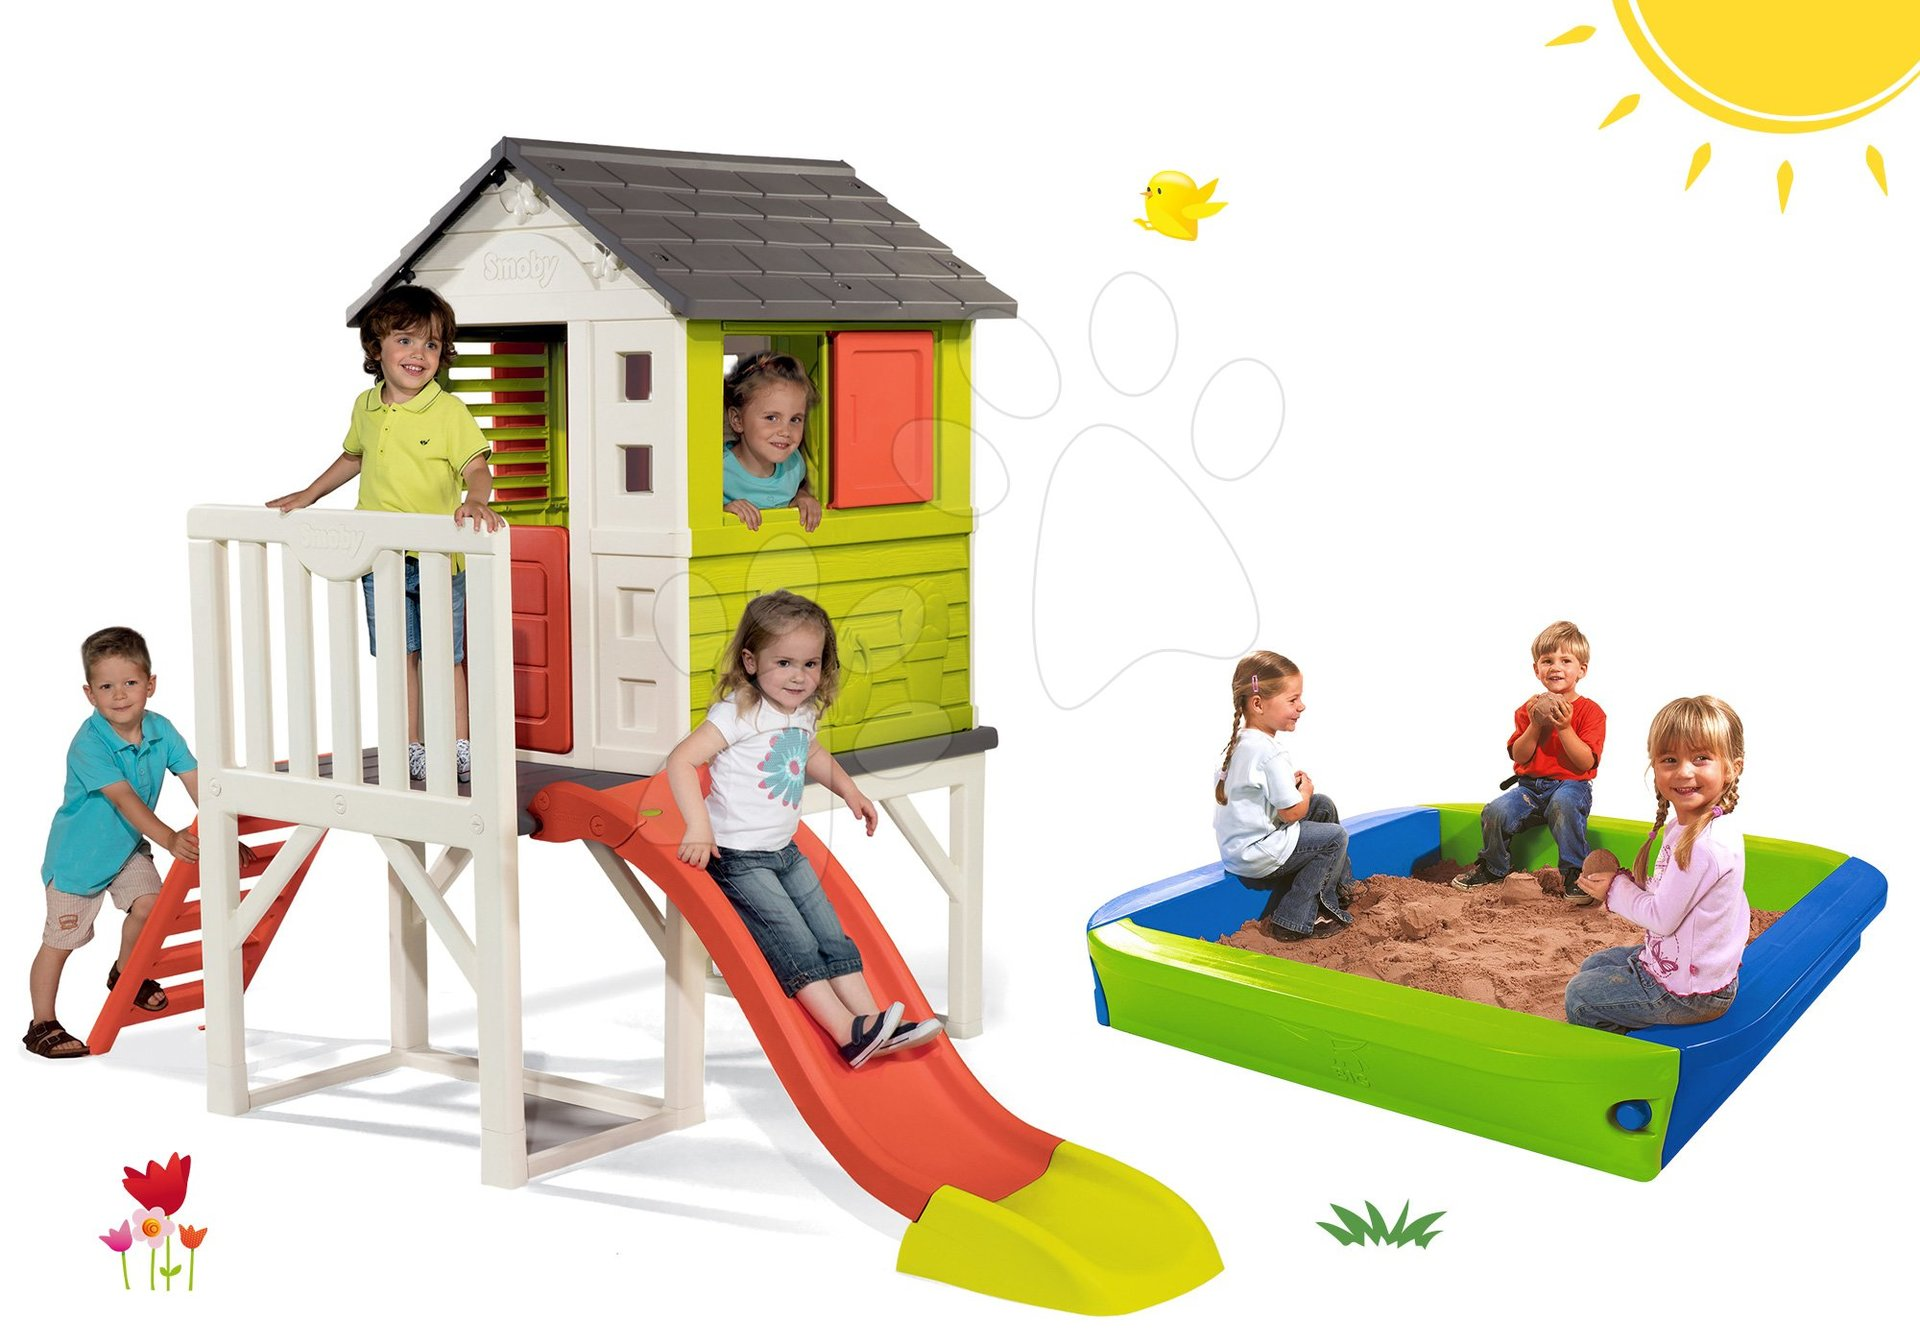 Smoby set detský domček na pilieroch Pilings House s 1,5 m šmykľavkou a pieskovisko s krycou plachtou 810800-21